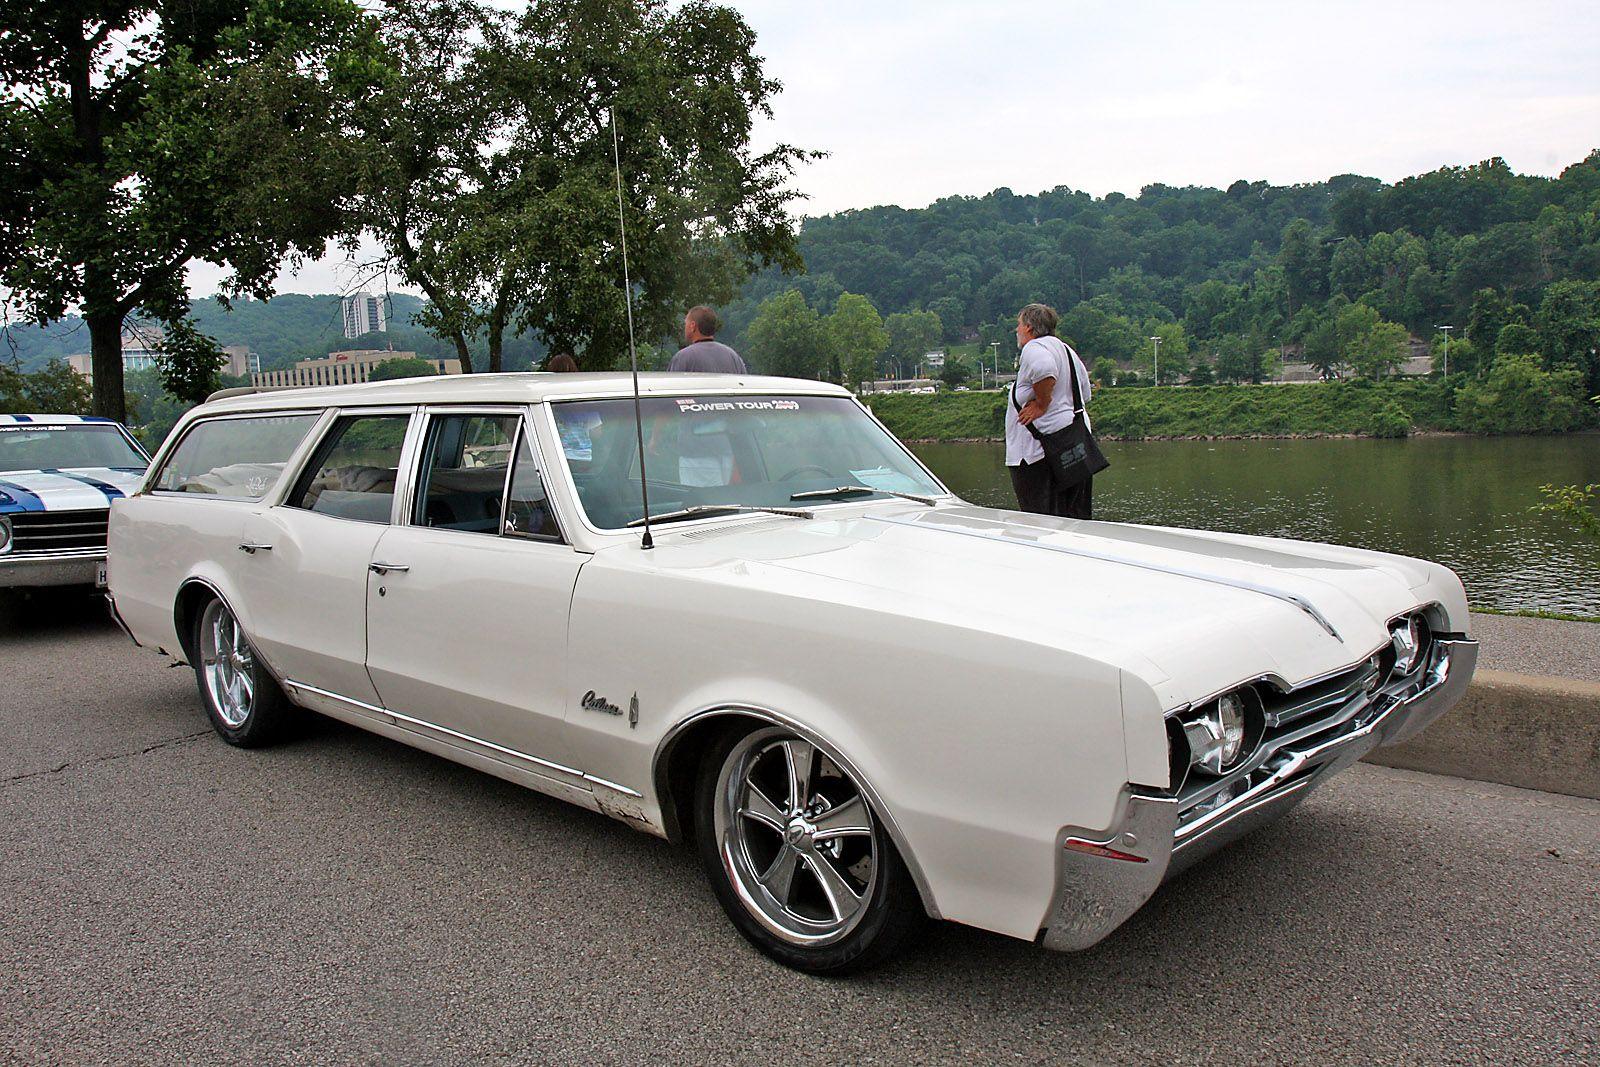 general motors 1967 oldsmobile cutlass custom cruiser station wagon mini vans old hot rods old wagons [ 1600 x 1067 Pixel ]